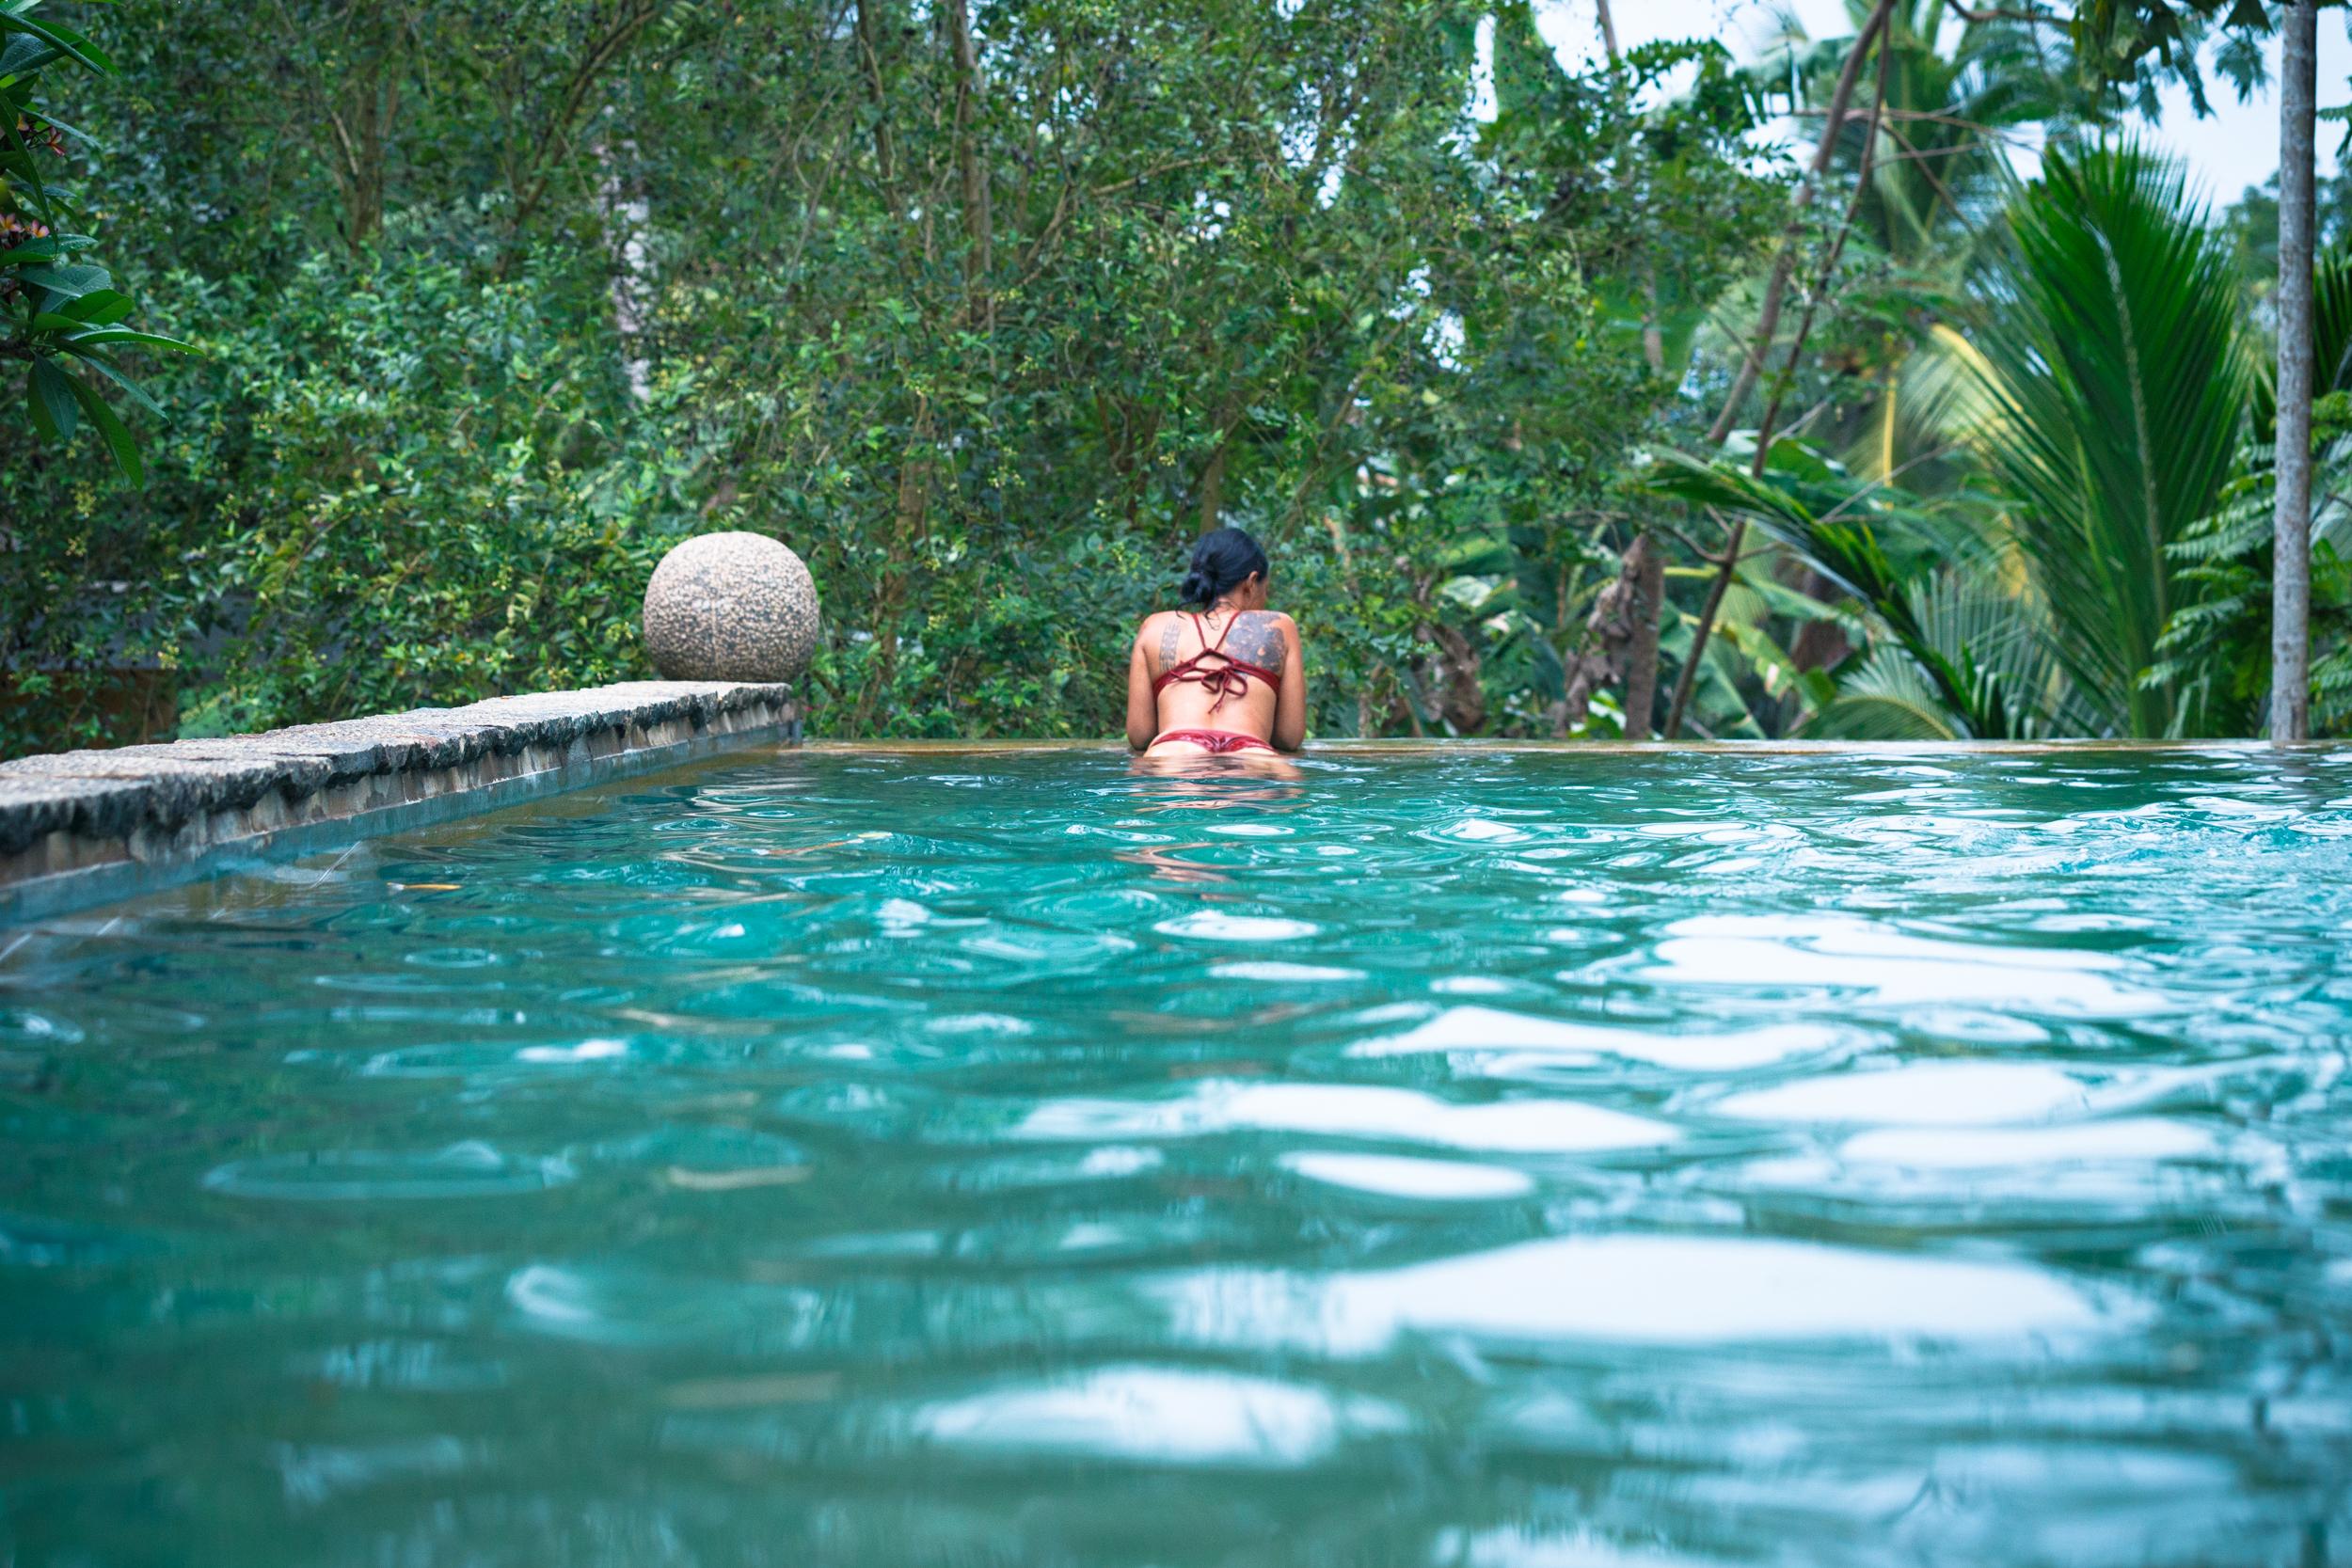 Enjoying the infinity pool in the jungle at Sri Yoga Shala.